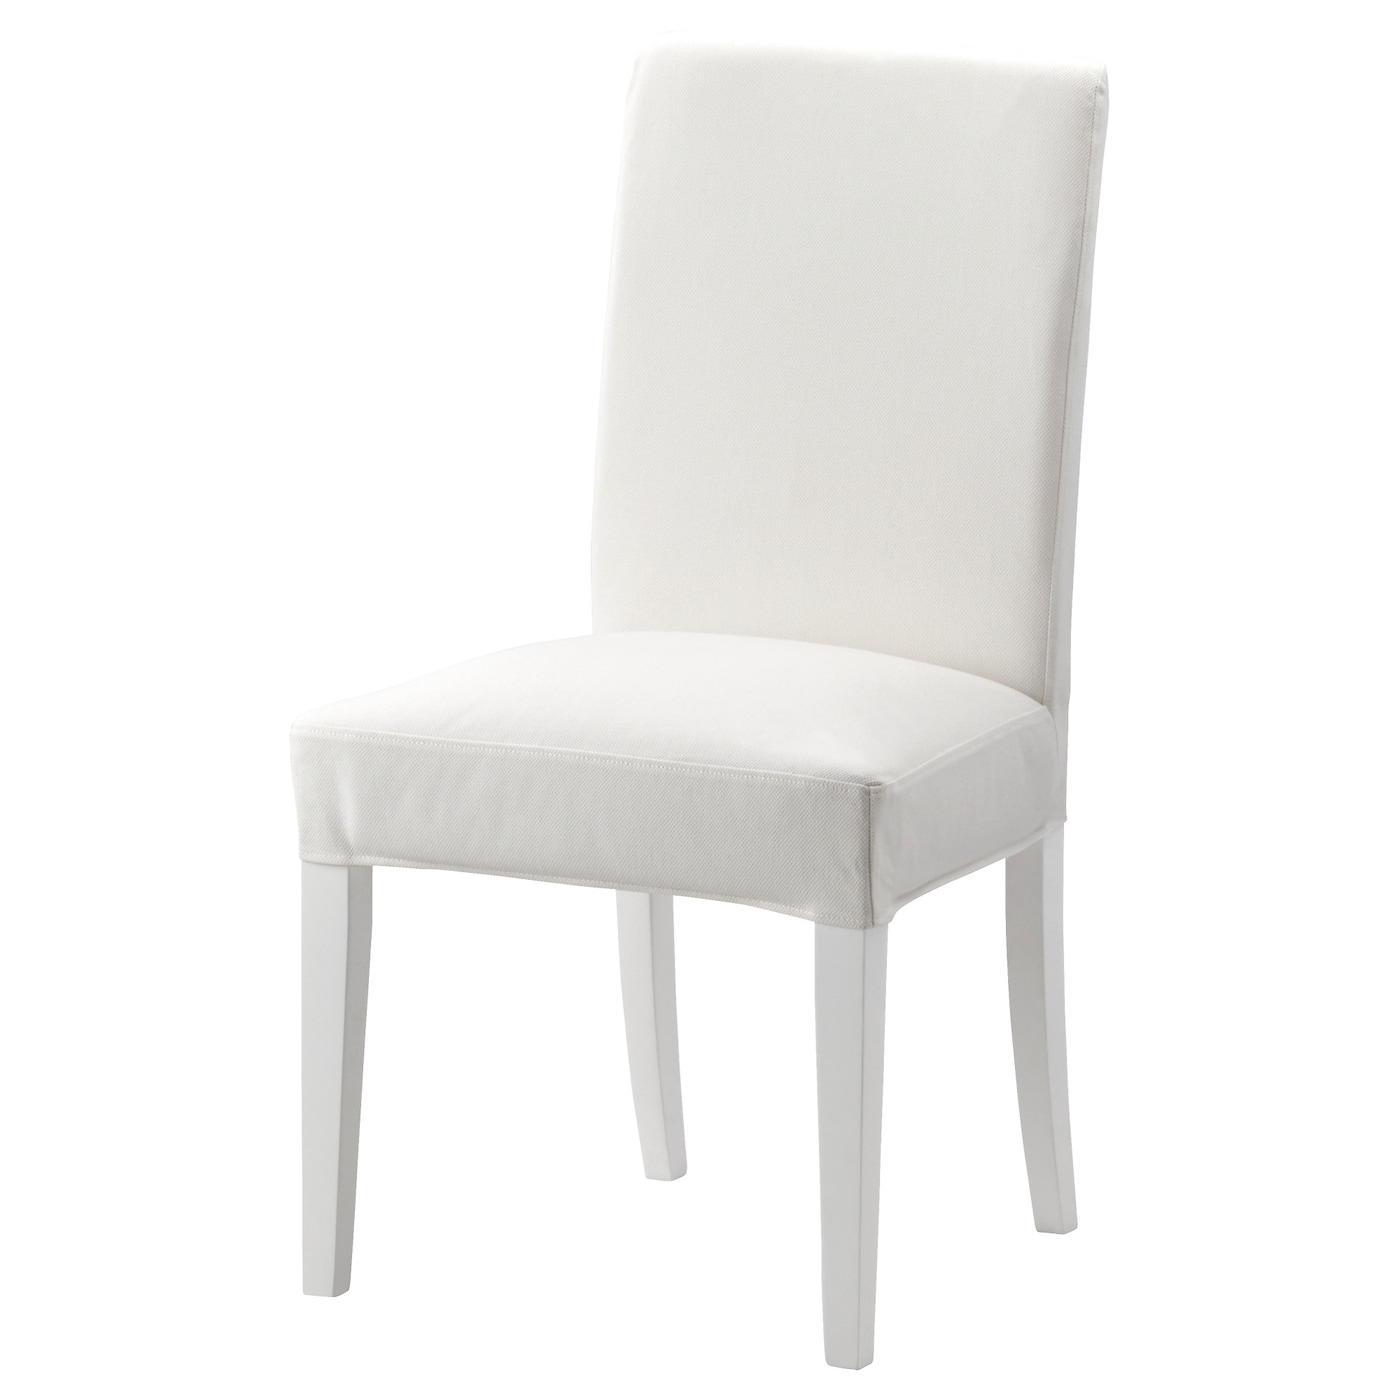 henriksdal chaise blanc gr sbo blanc ikea. Black Bedroom Furniture Sets. Home Design Ideas